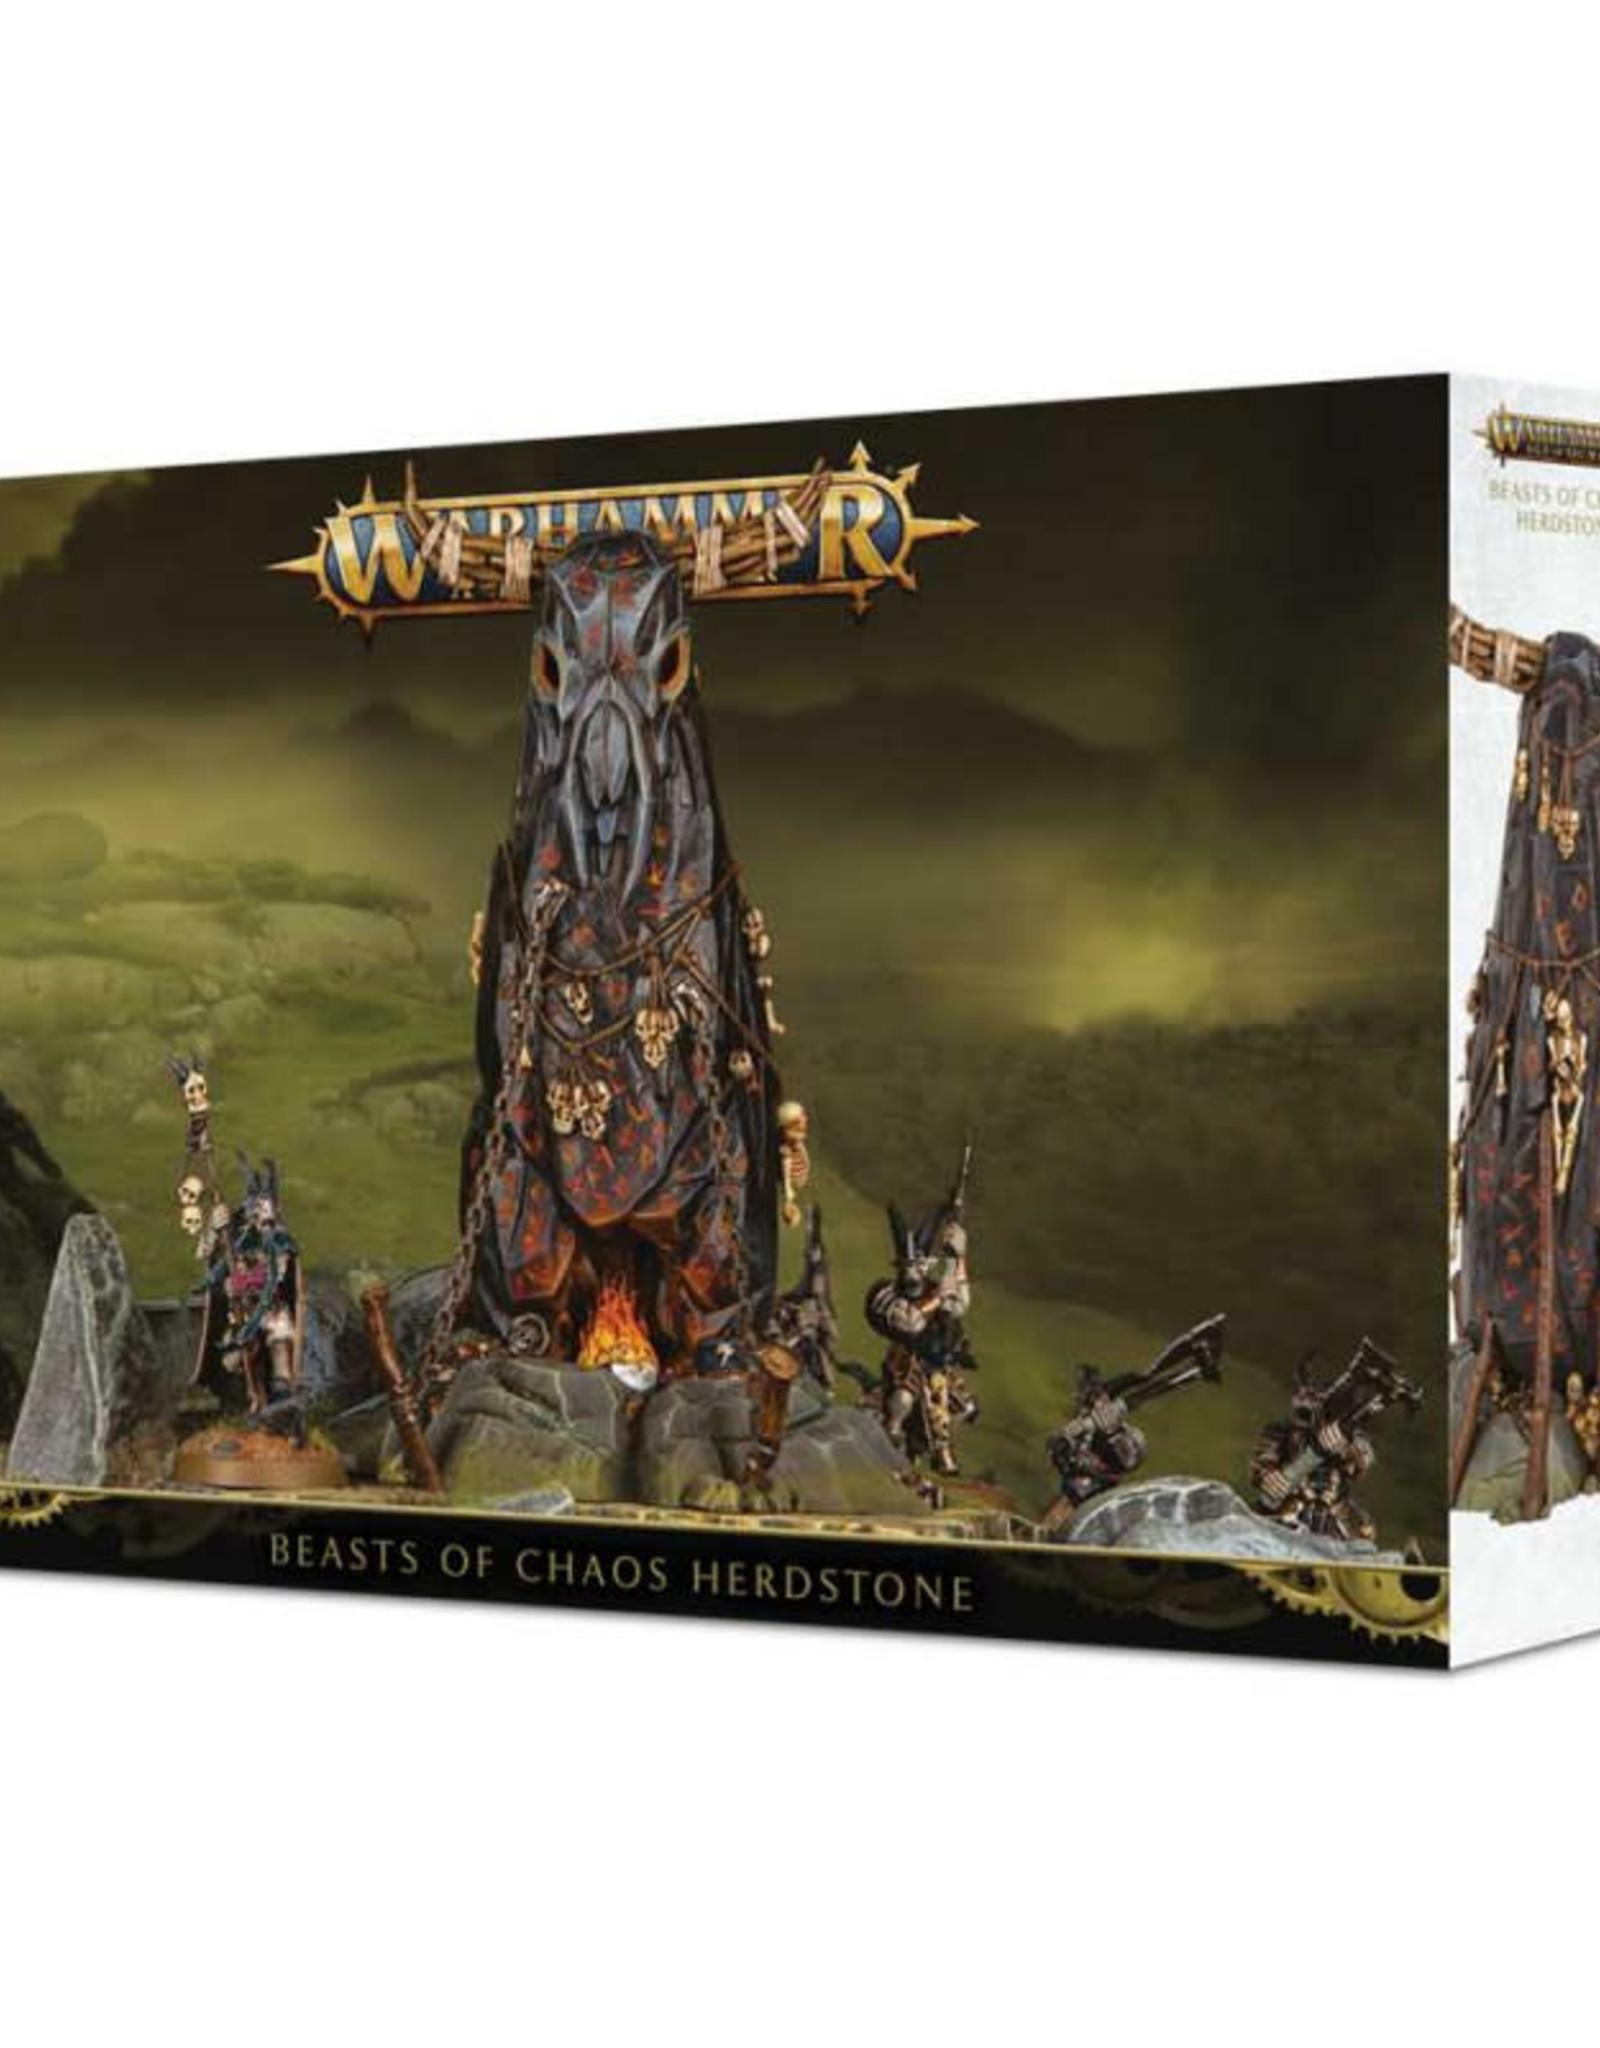 Games Workshop Warhammer AOS Beasts of Chaos Herdstone